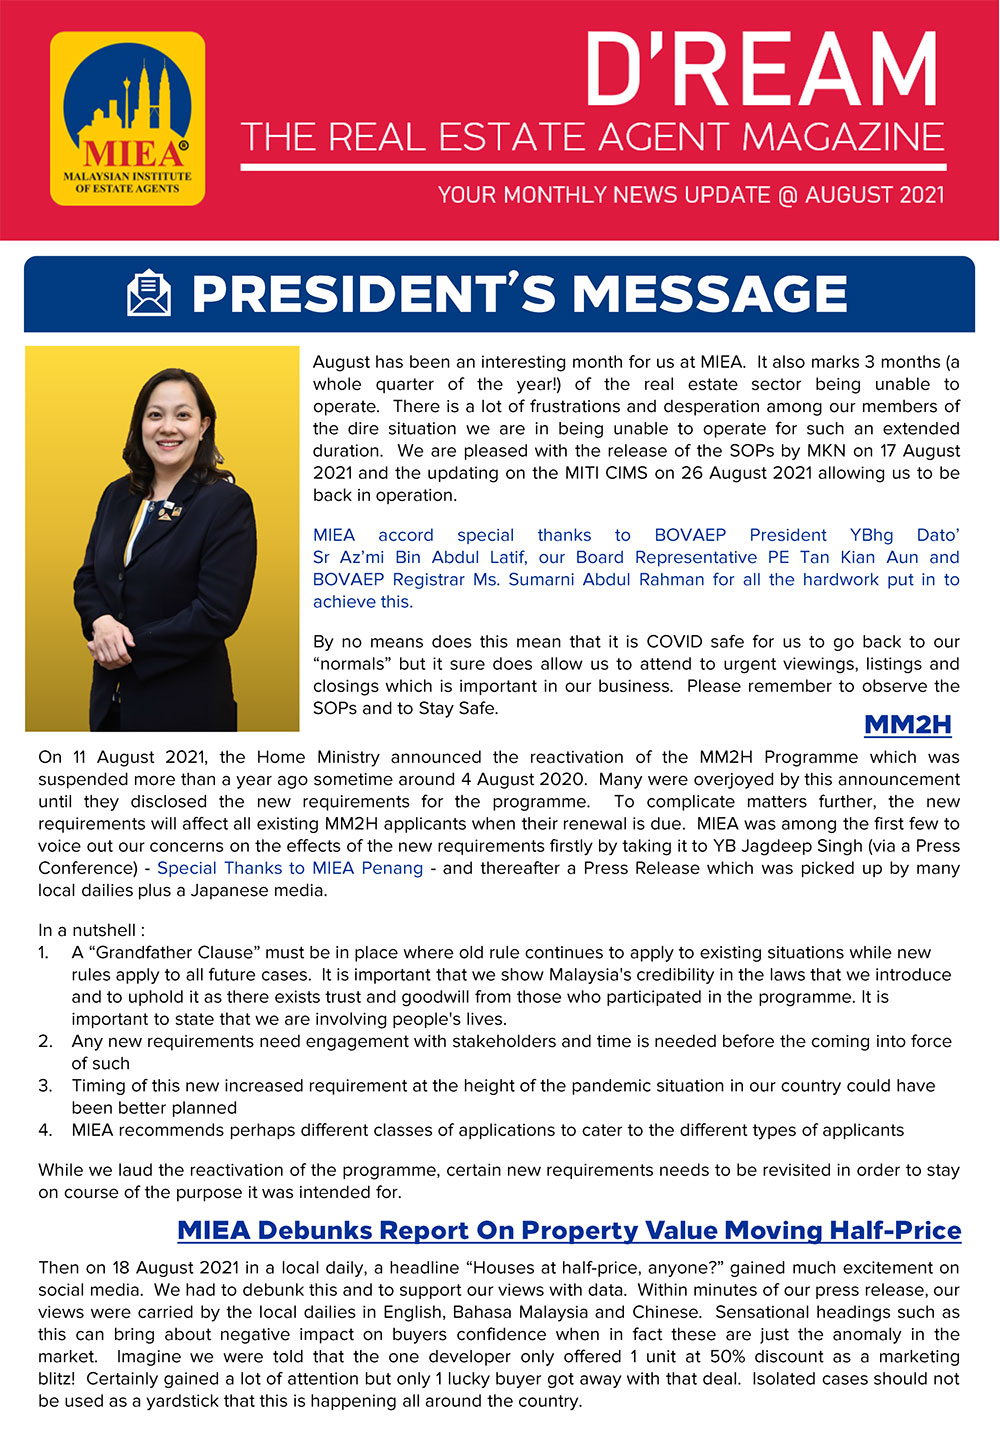 D'REAM Bulletin Issue - August 2021